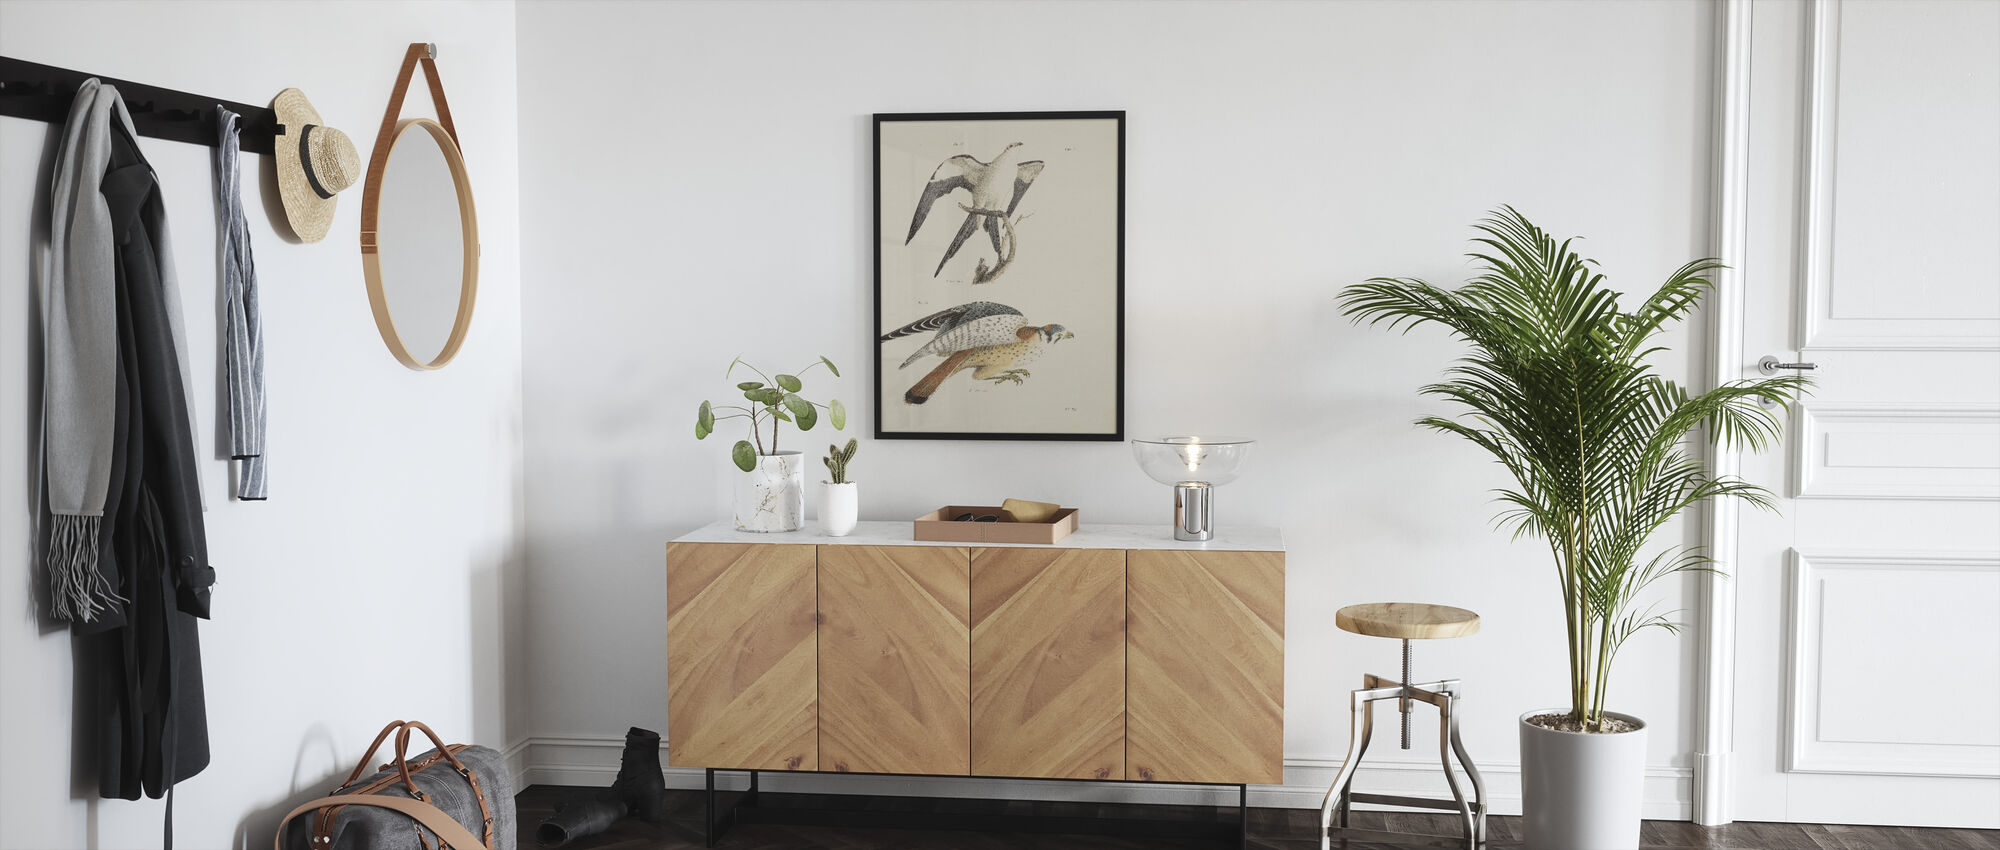 Rovfåglar I - Inramad tavla - Hall